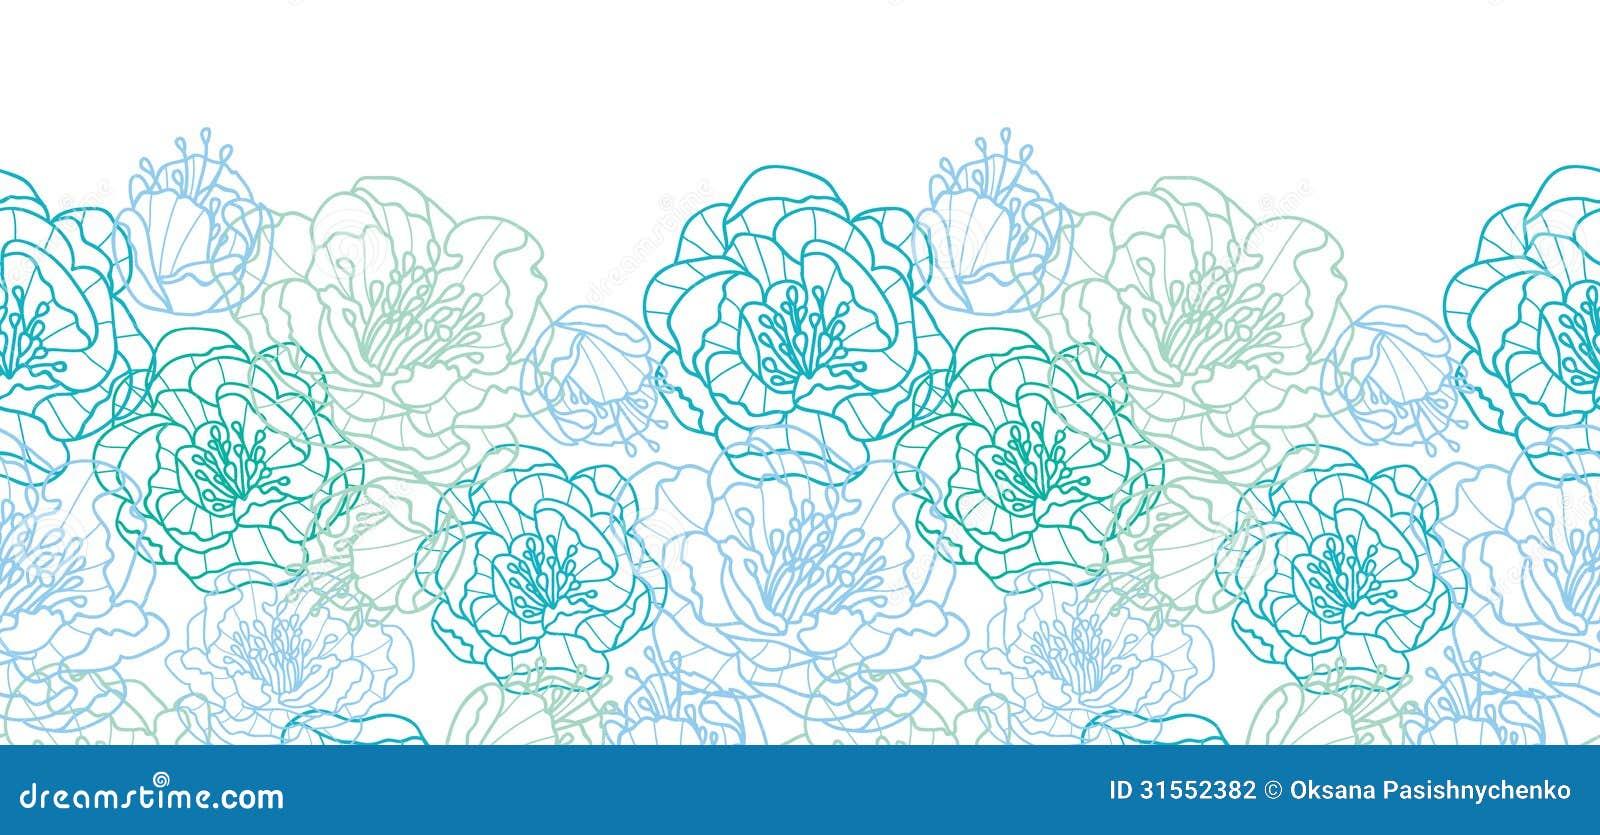 Line Art Flower Background : Blue line art flowers horizontal seamless pattern stock